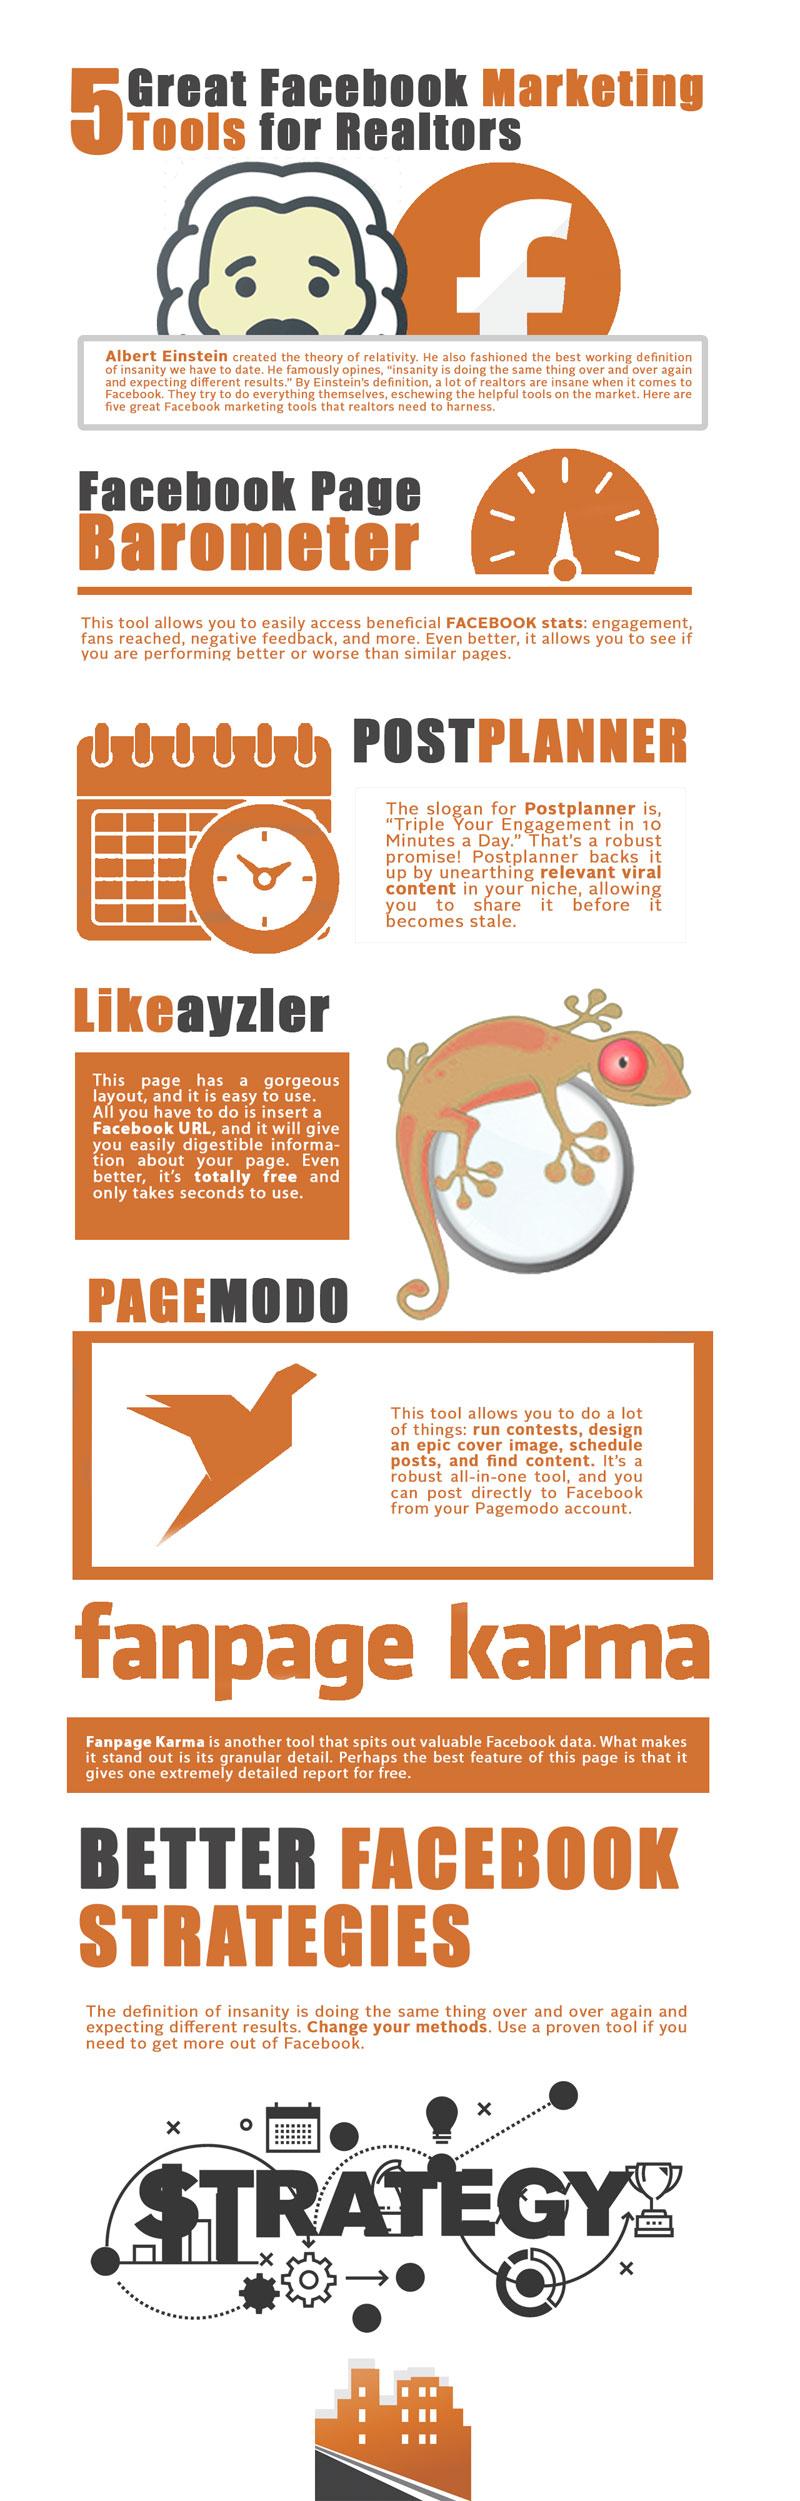 facebook marketing tools realtors infographic